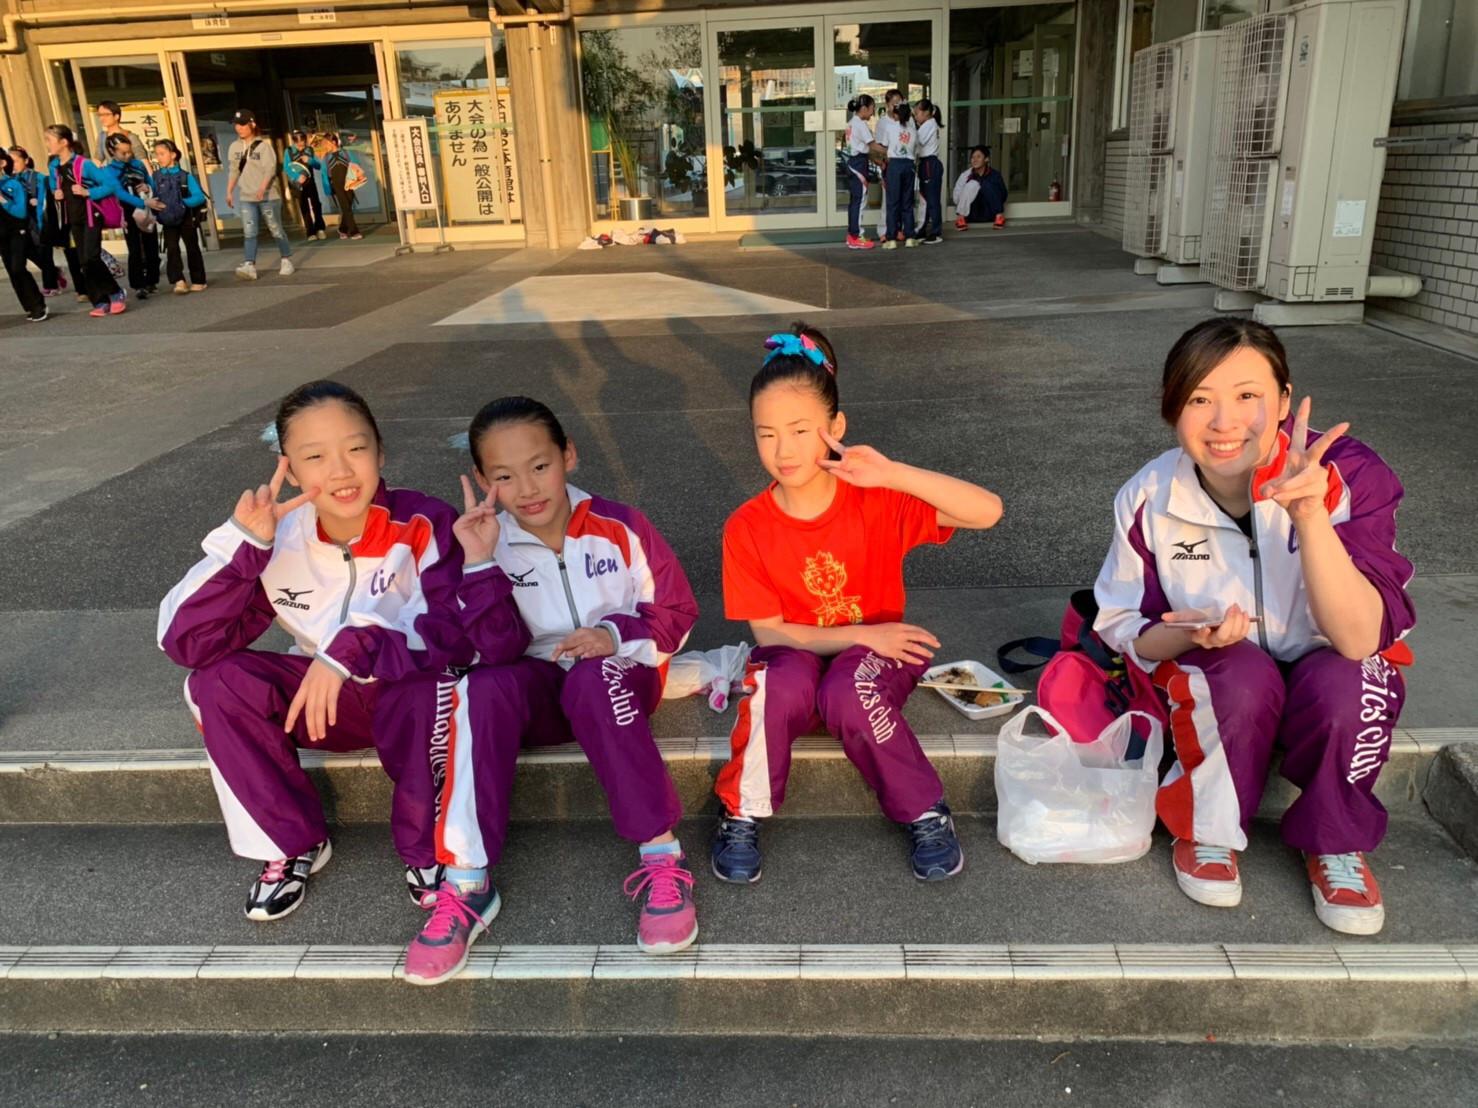 2019年AJG大会in三重県画像3